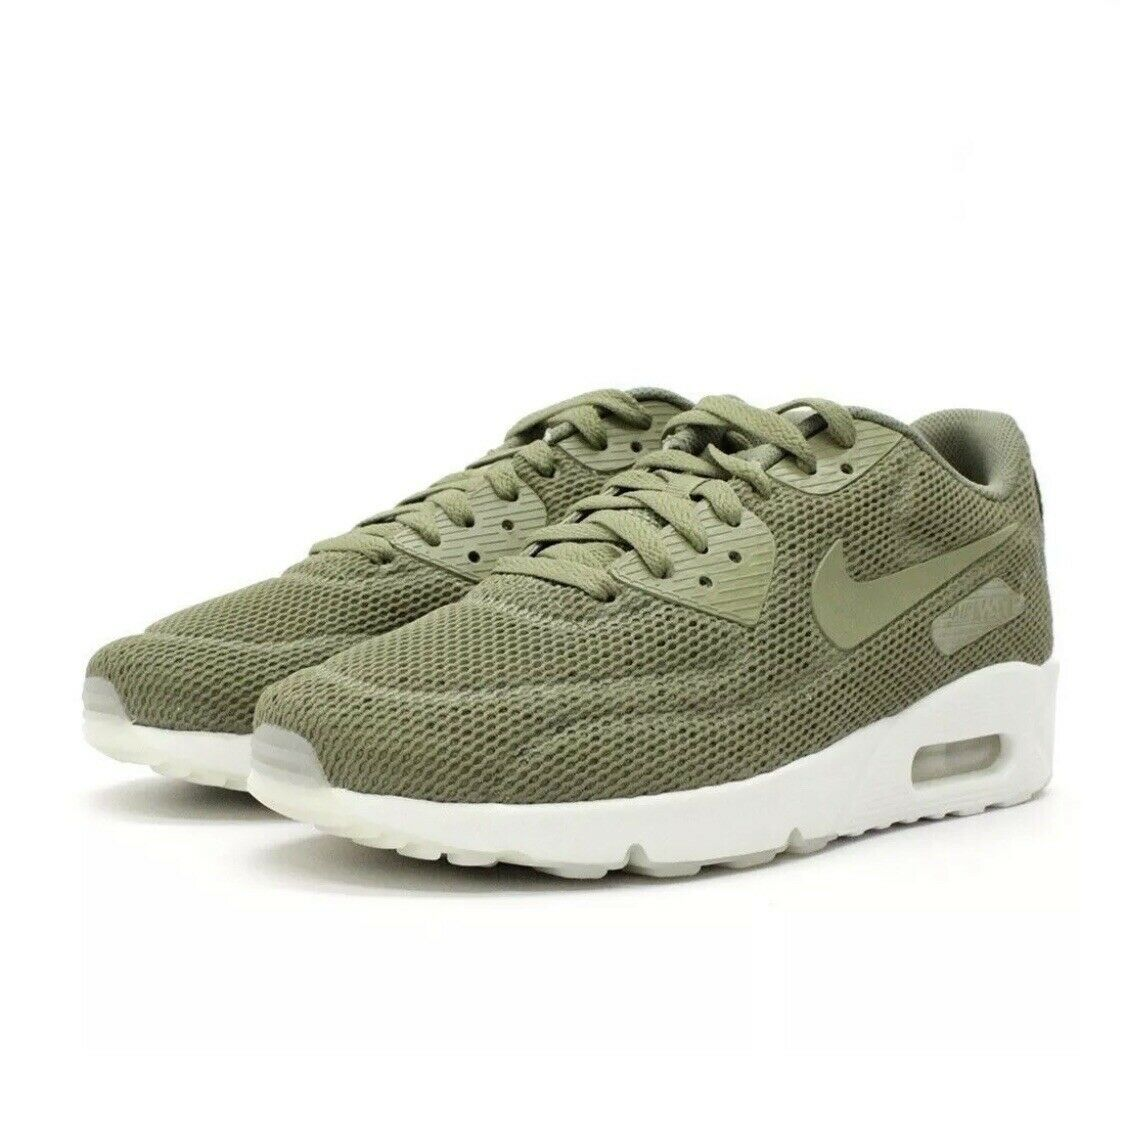 75d8574170 Nike Men's Air Max 90 Ultra 2.0 Breathe Size 9 Green White Mesh 898010-200